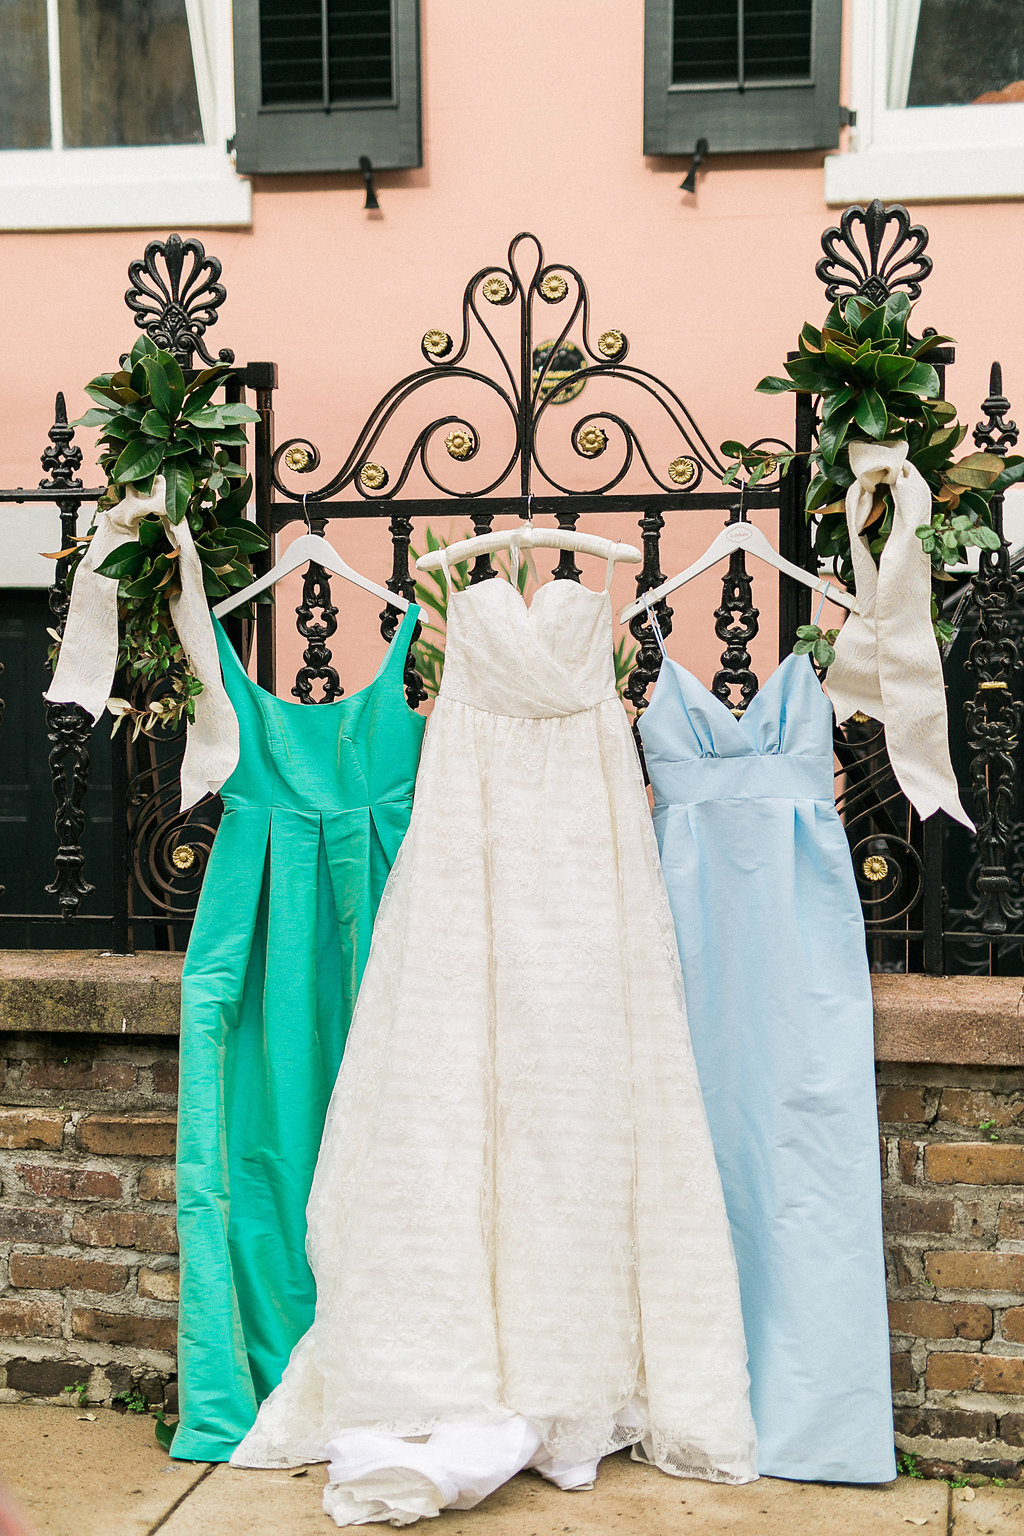 charleston spring brunch elopement pop up wedding planners at the parsonage - atlanta, greenville wedding planners - scarlet plan & design (23).jpg